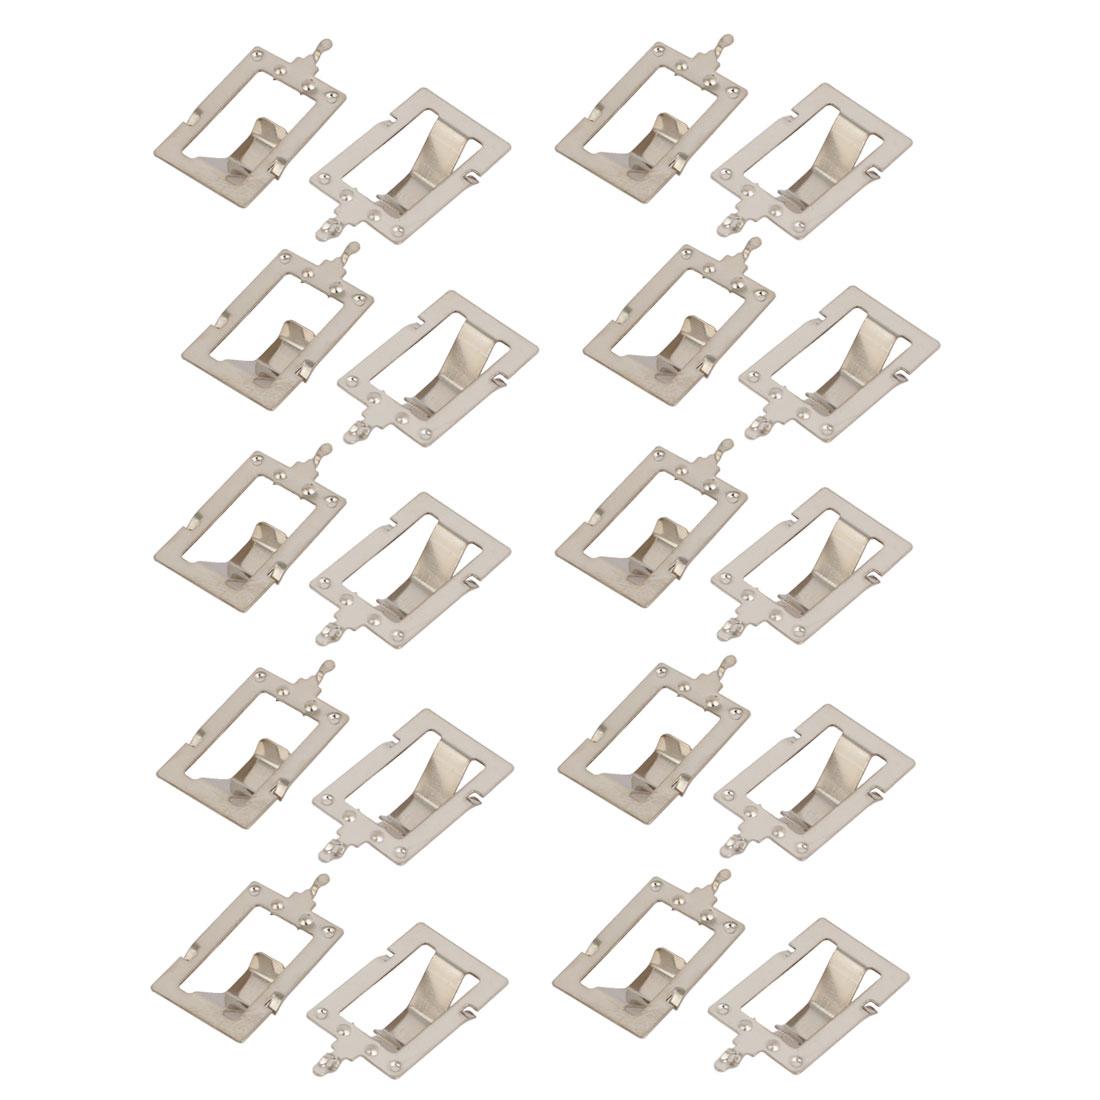 20Pcs Silver Tone Metal 18650 Battery Positive Negative Contact Shrapnel Plate